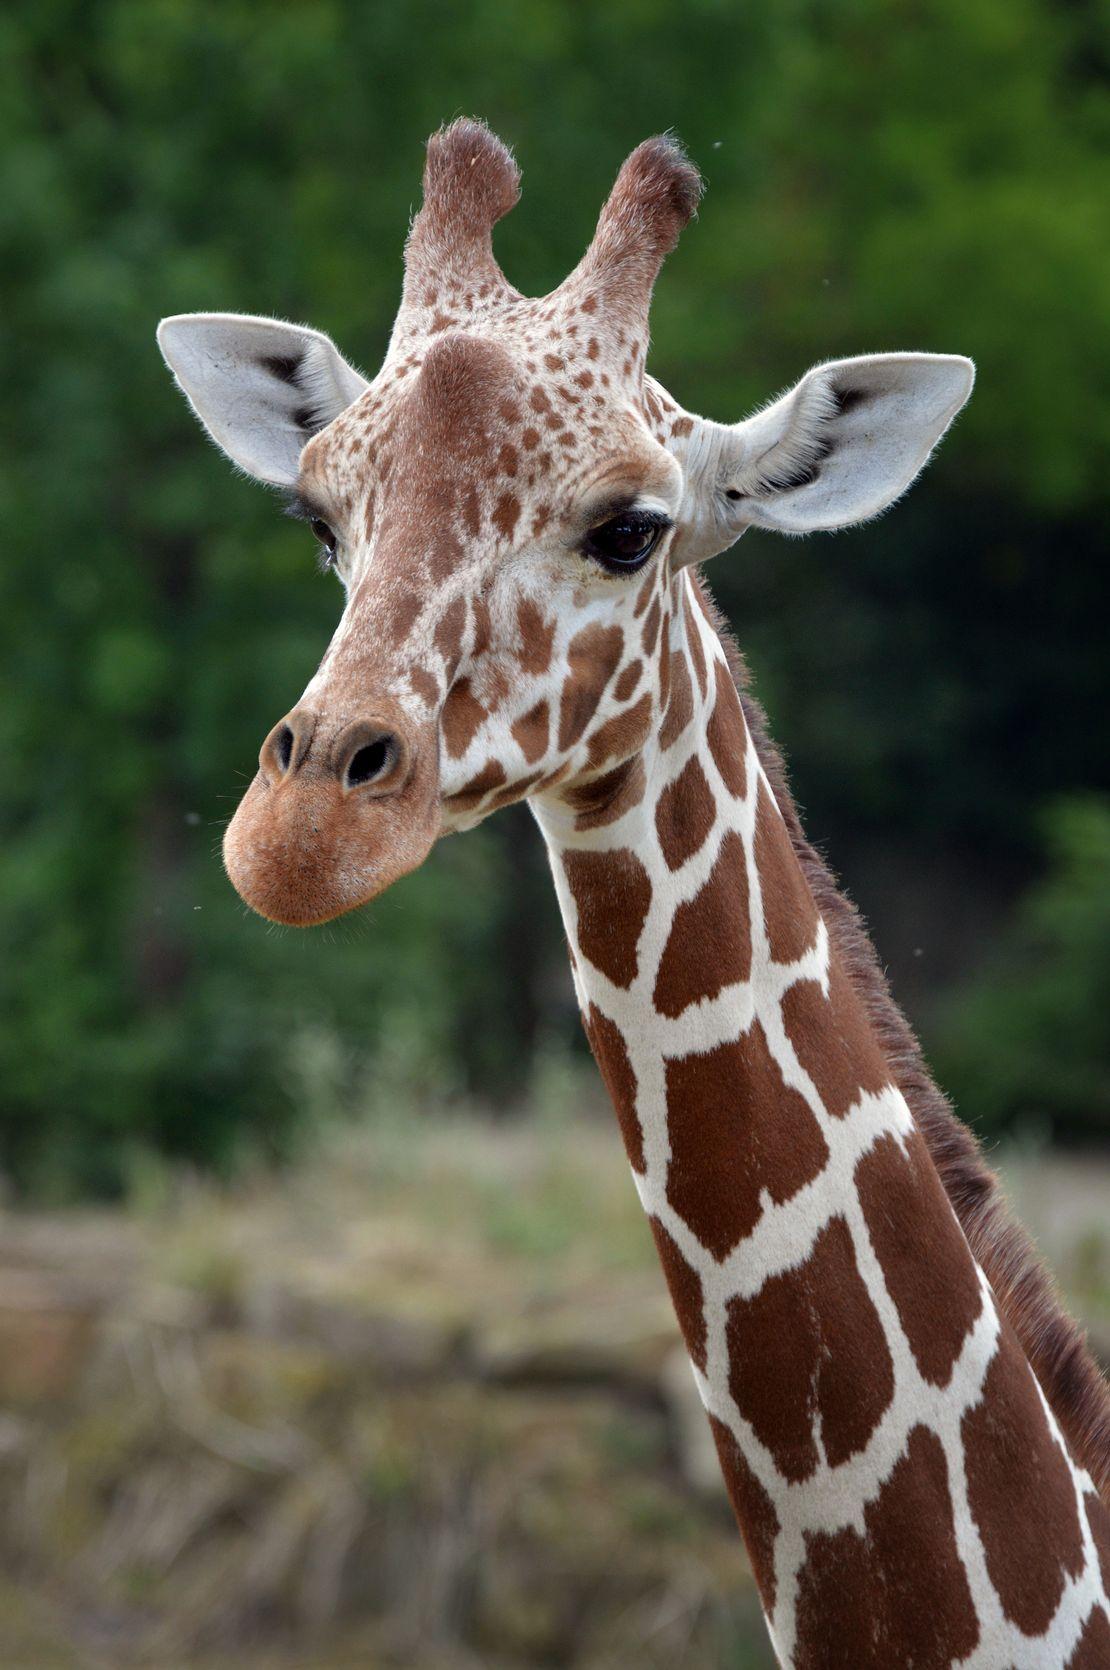 Regionální, historické, České a Slovenské plemenné knihy žiraf Rothschildových a žiraf síťovaných.